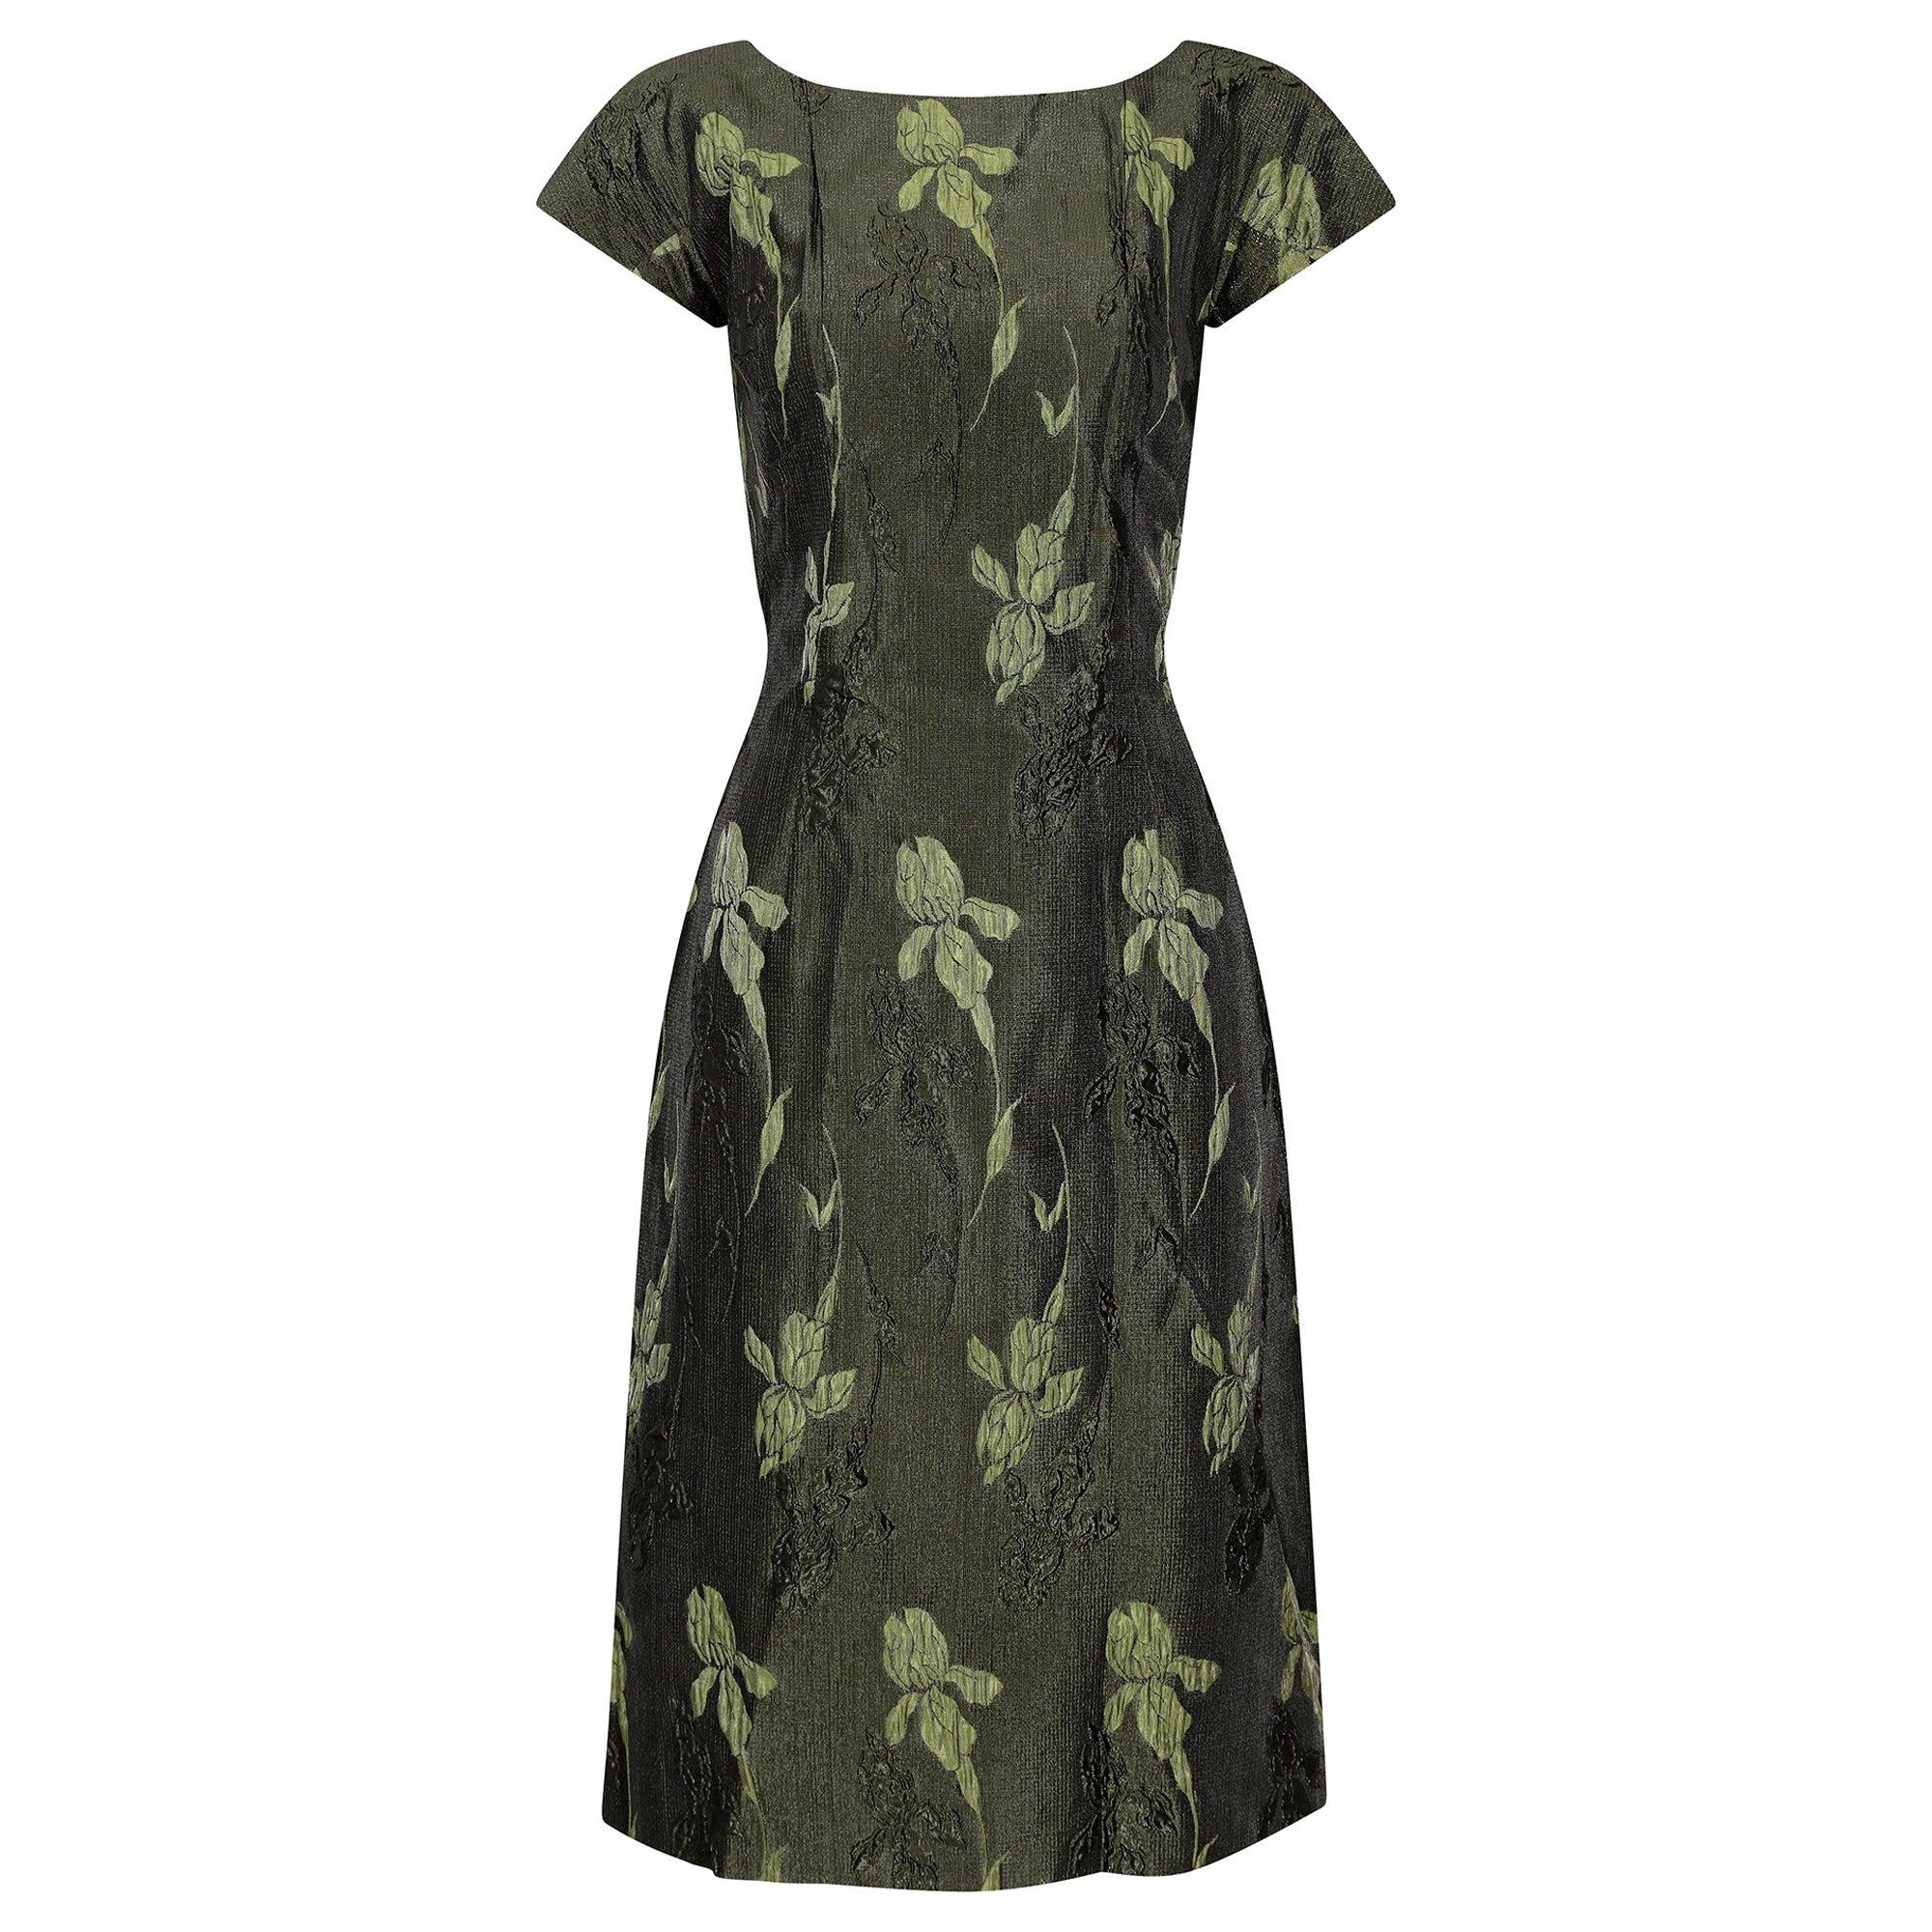 1960s Green Floral Metallic Brocade Dress